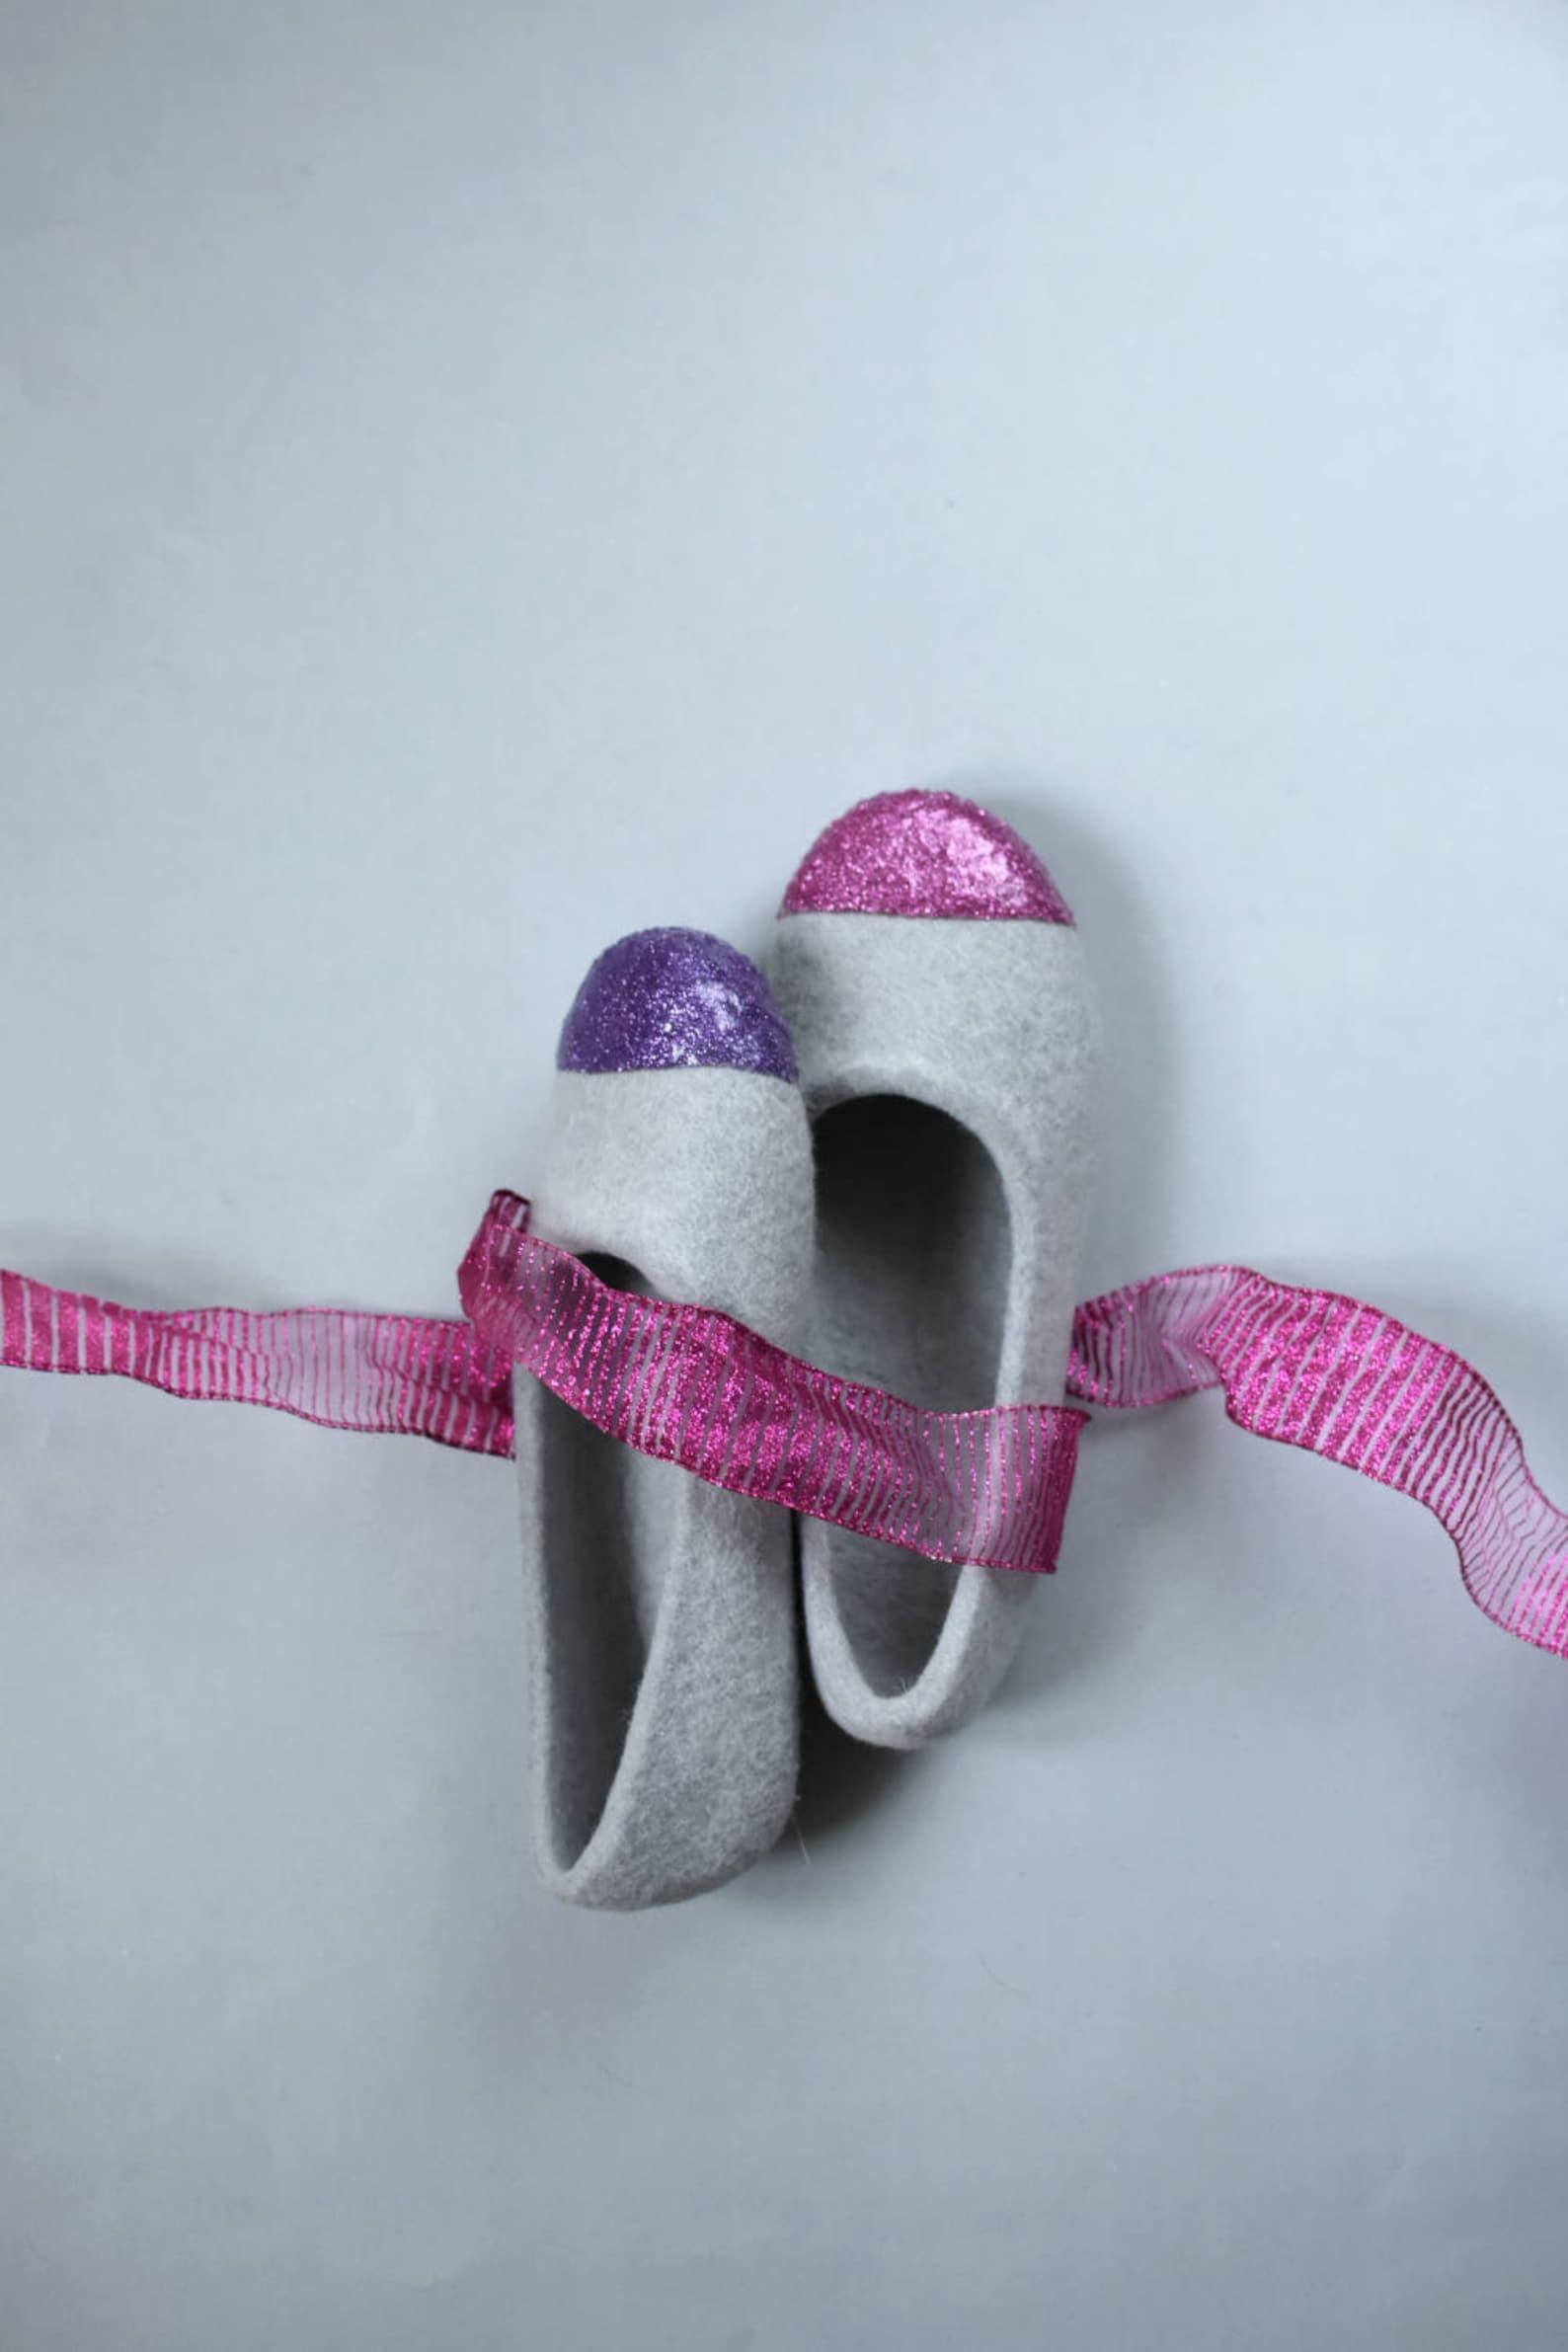 women felted ballet flats - glitter slippers - women felt slippers - grey slippers for her - wool slippers - fuchsia glitter - p